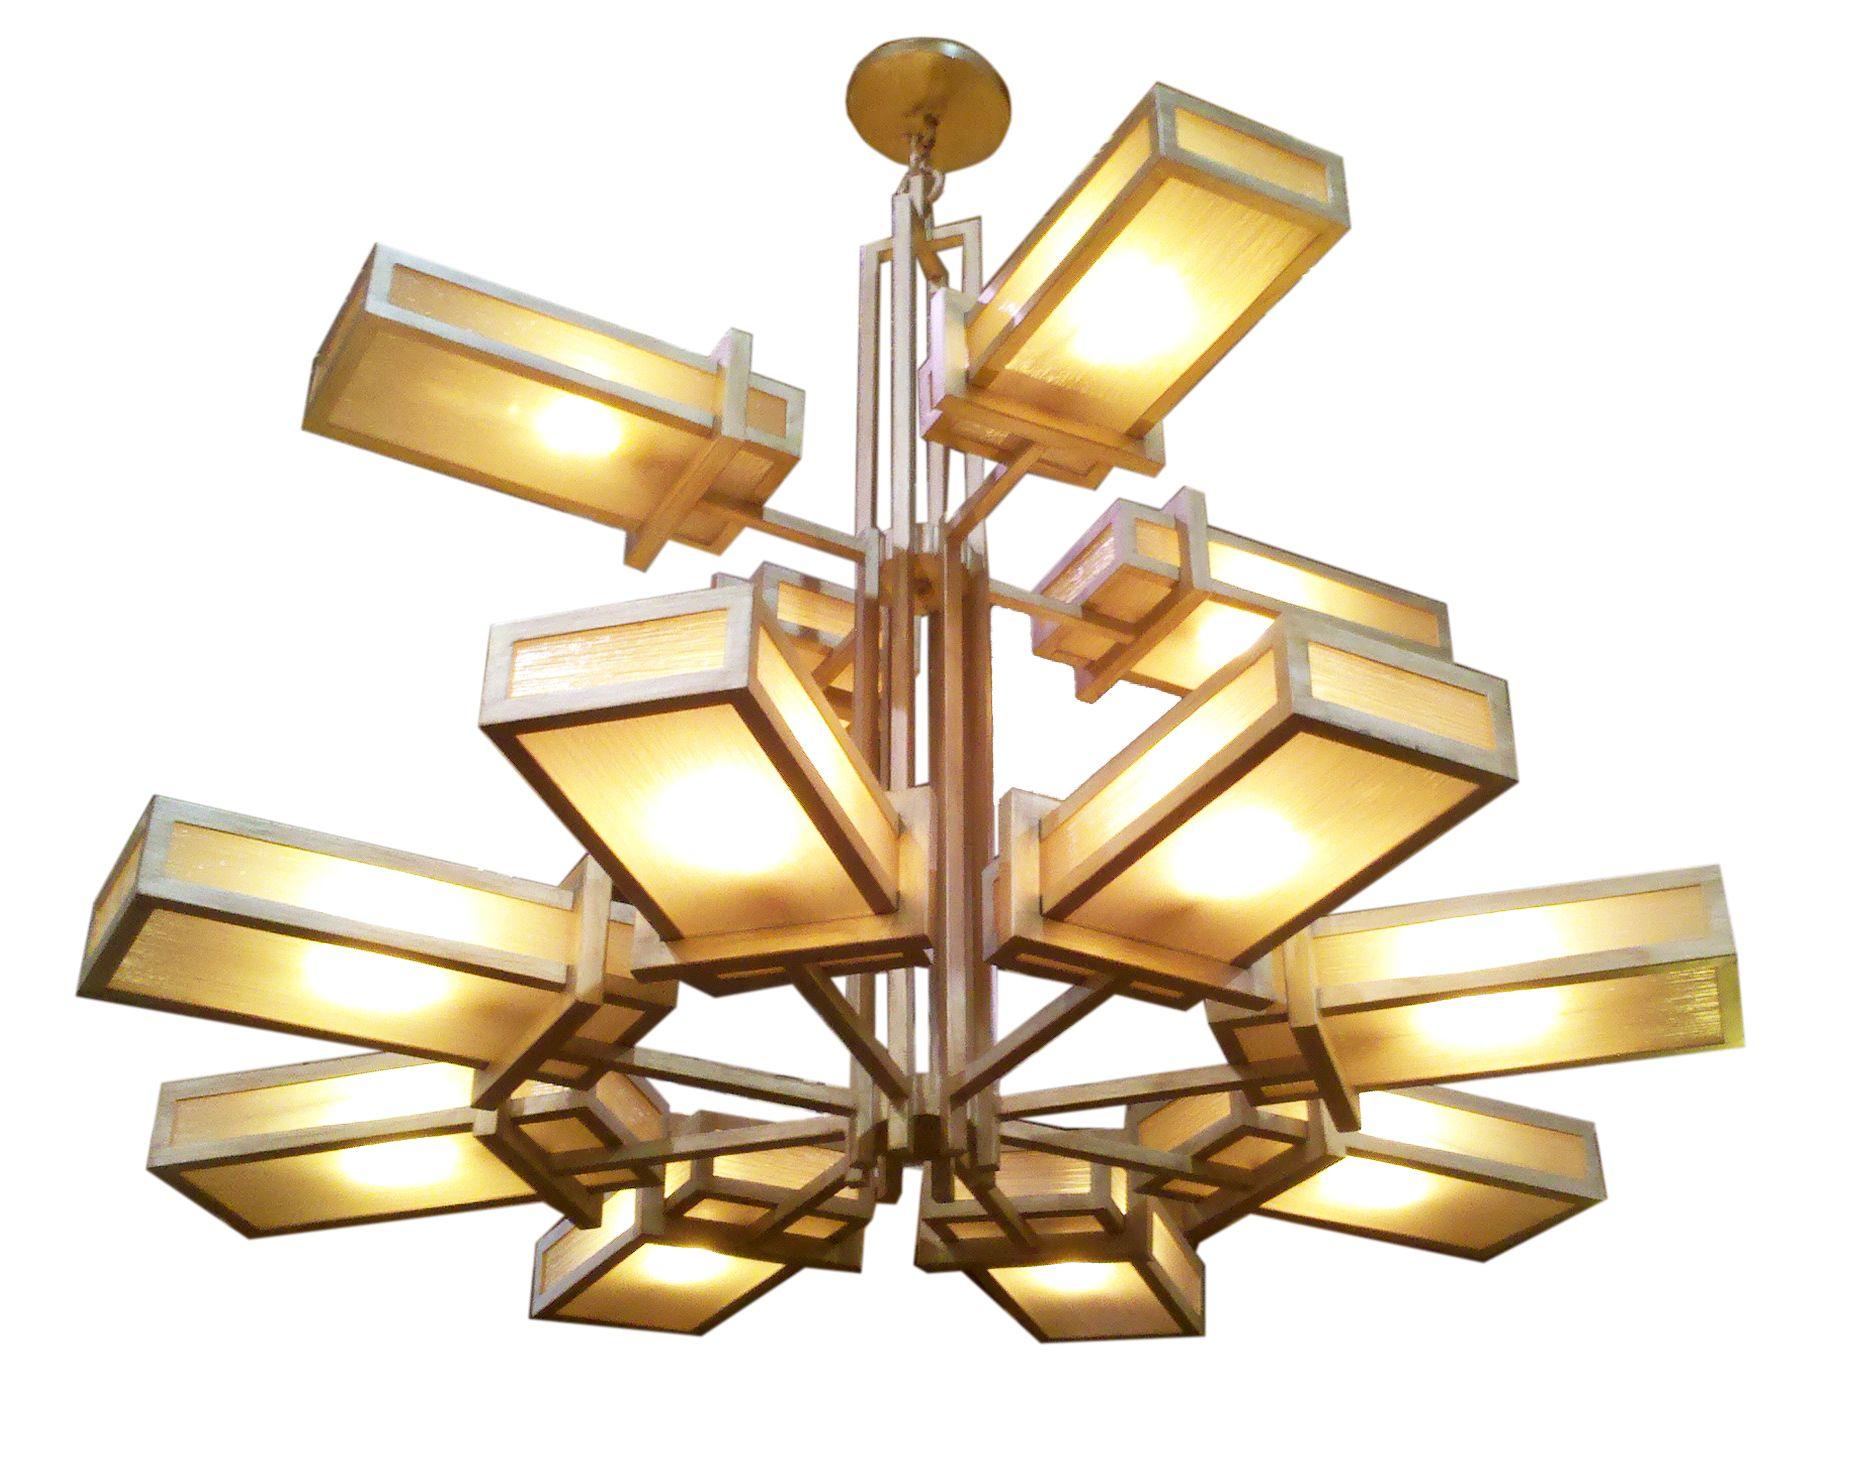 karlin lighting dessin interiors by hall lantern companies pin chandeliers fournir